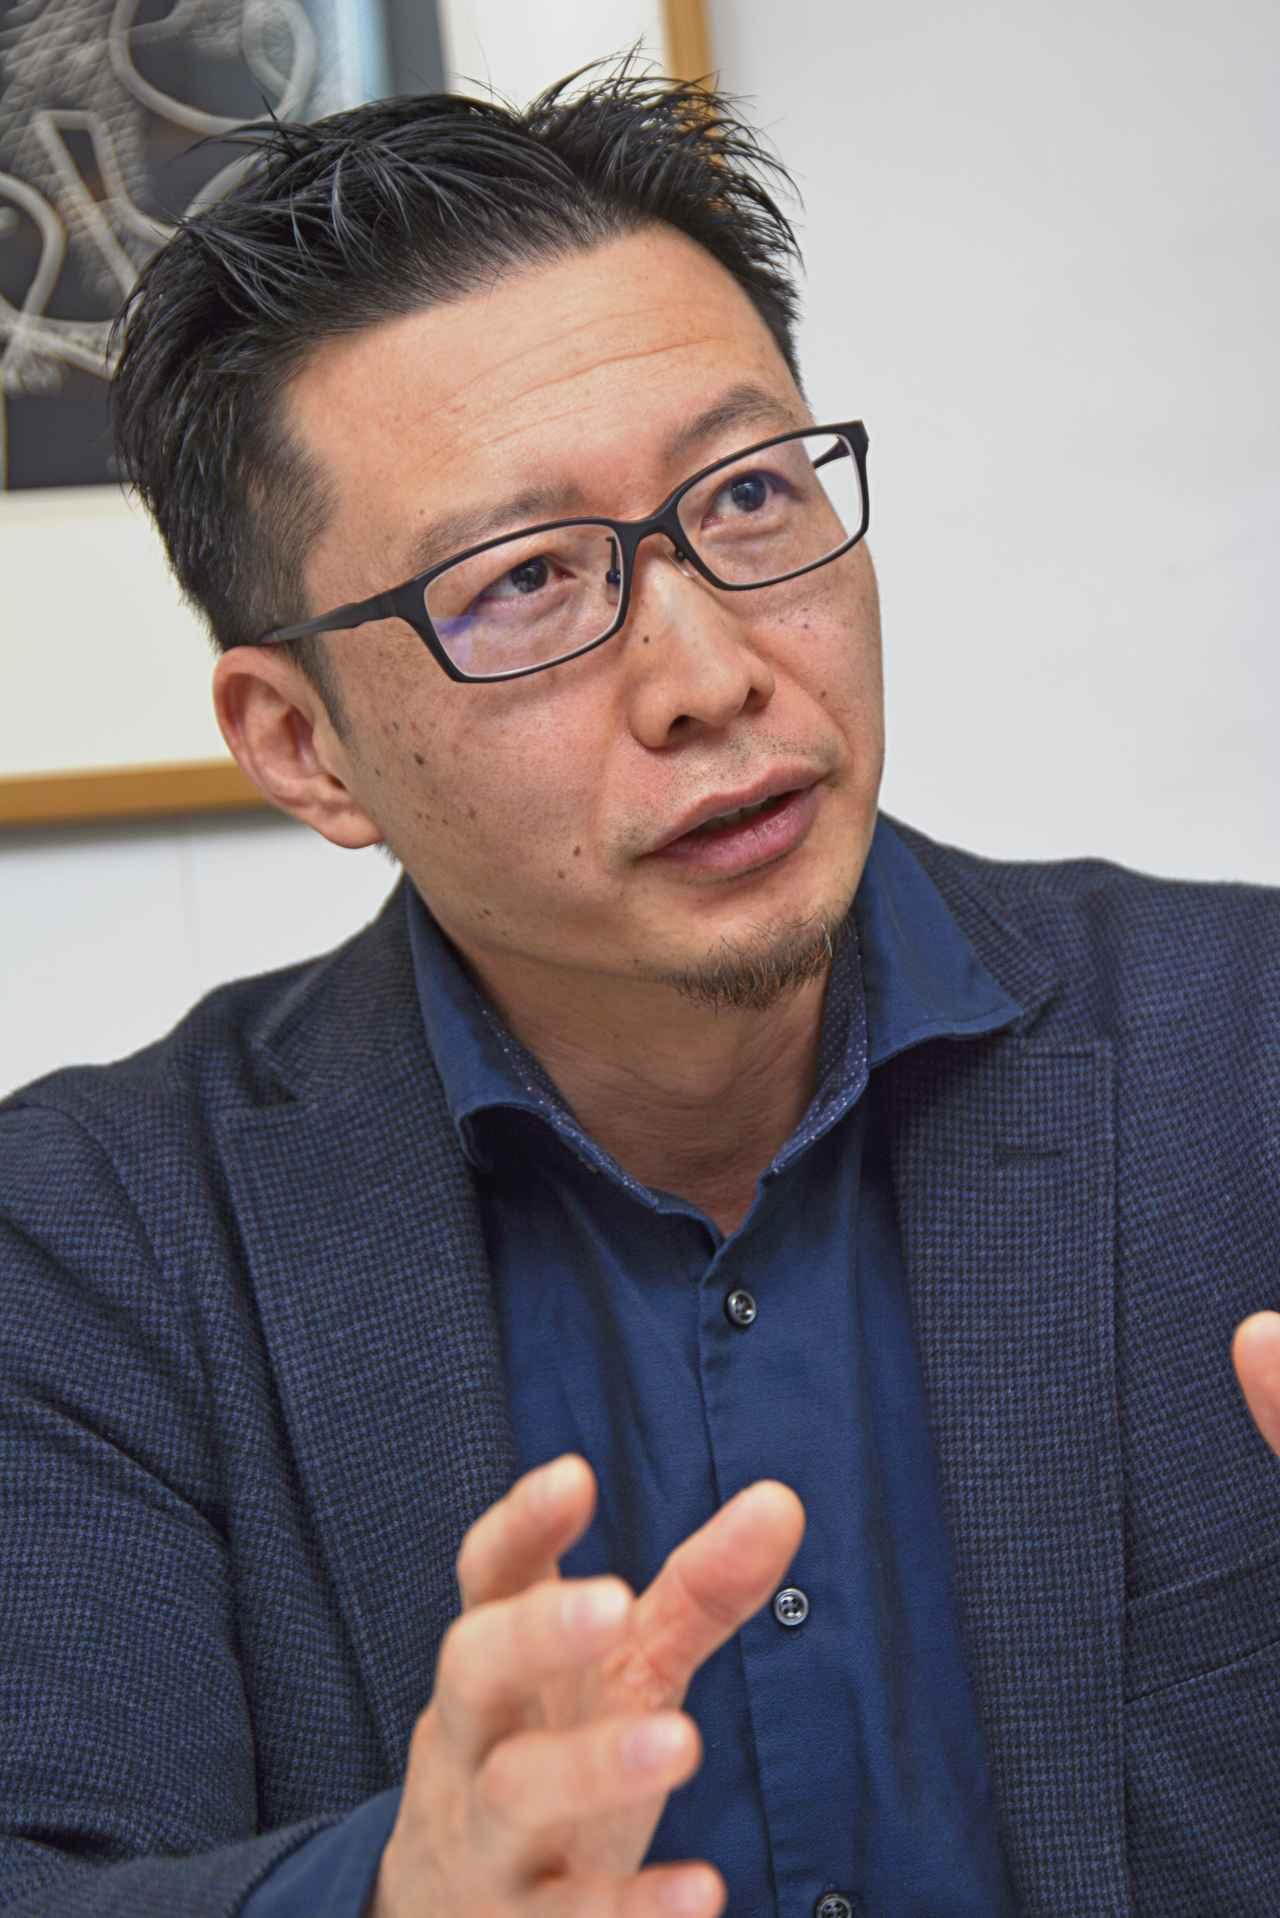 画像: ケルンメッセ株式会社 代表取締役社長 高木誠氏